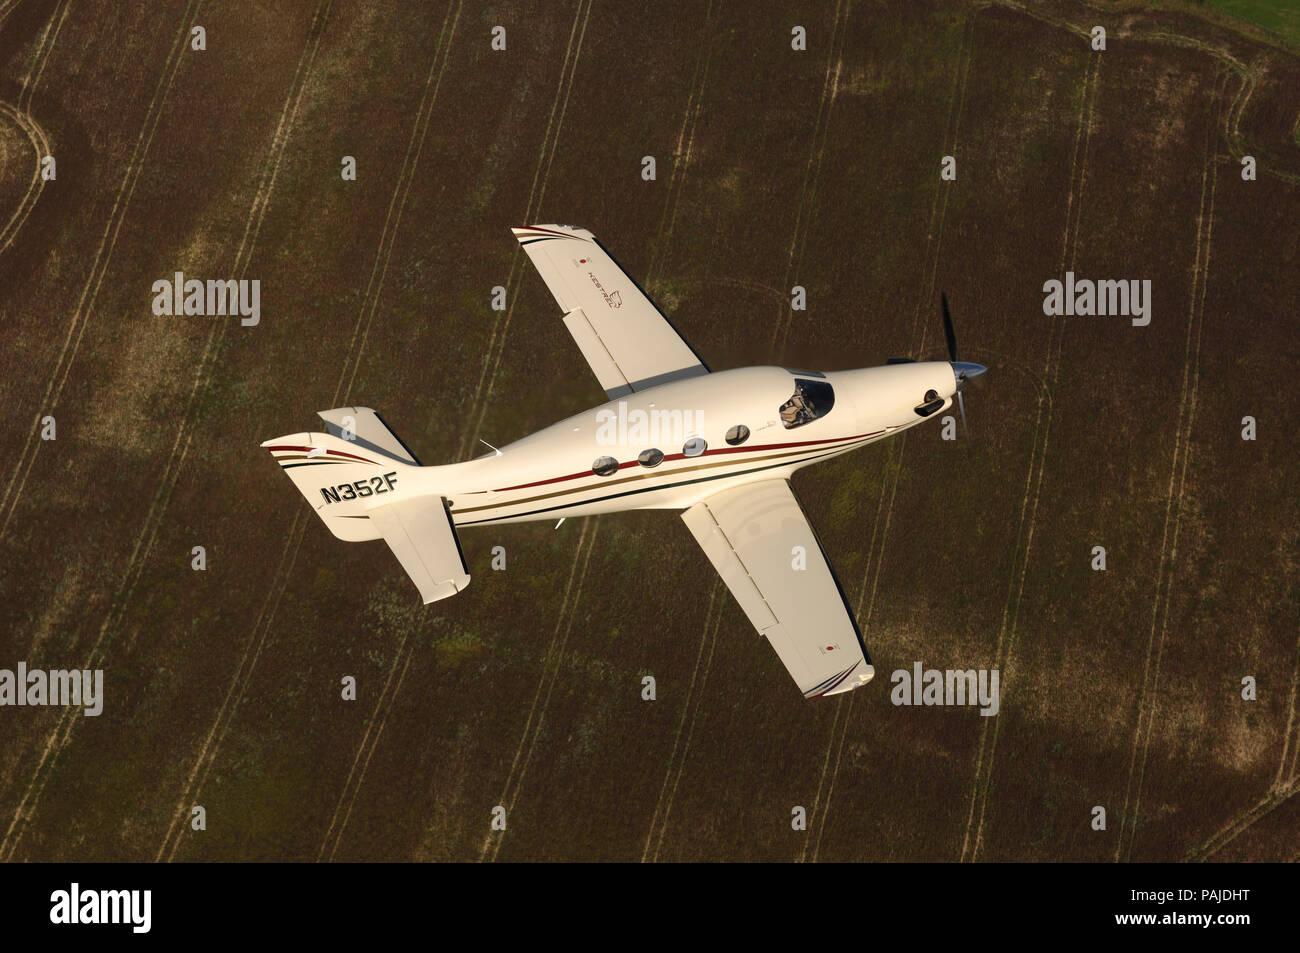 Farnborough F1 Kestrel prototype flying over fields Stock Photo